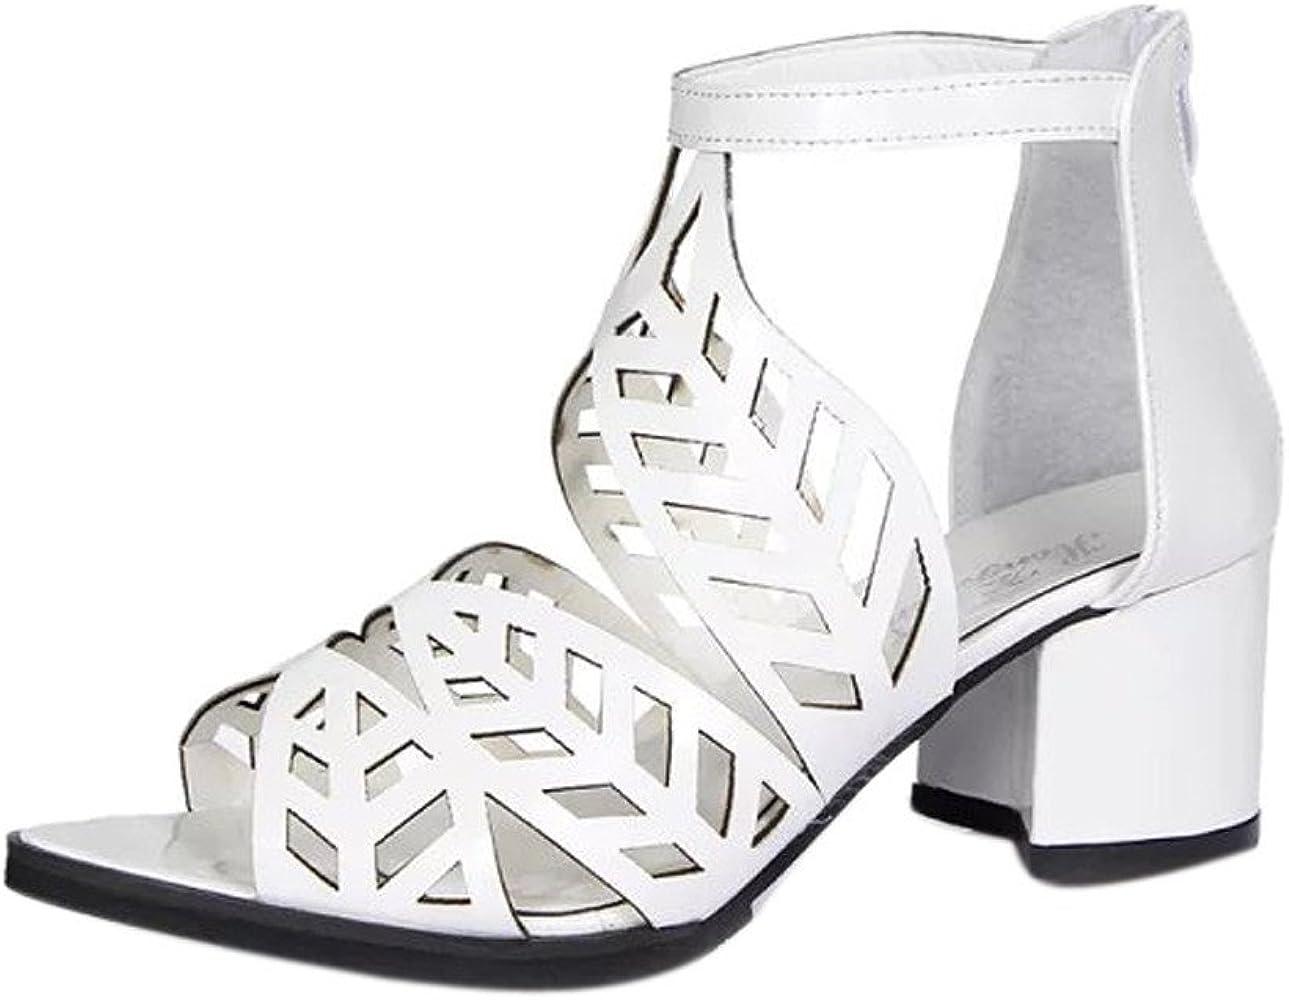 Sandalias Mujer Verano 2019,YiYLunneo Zapatos De Mujer De